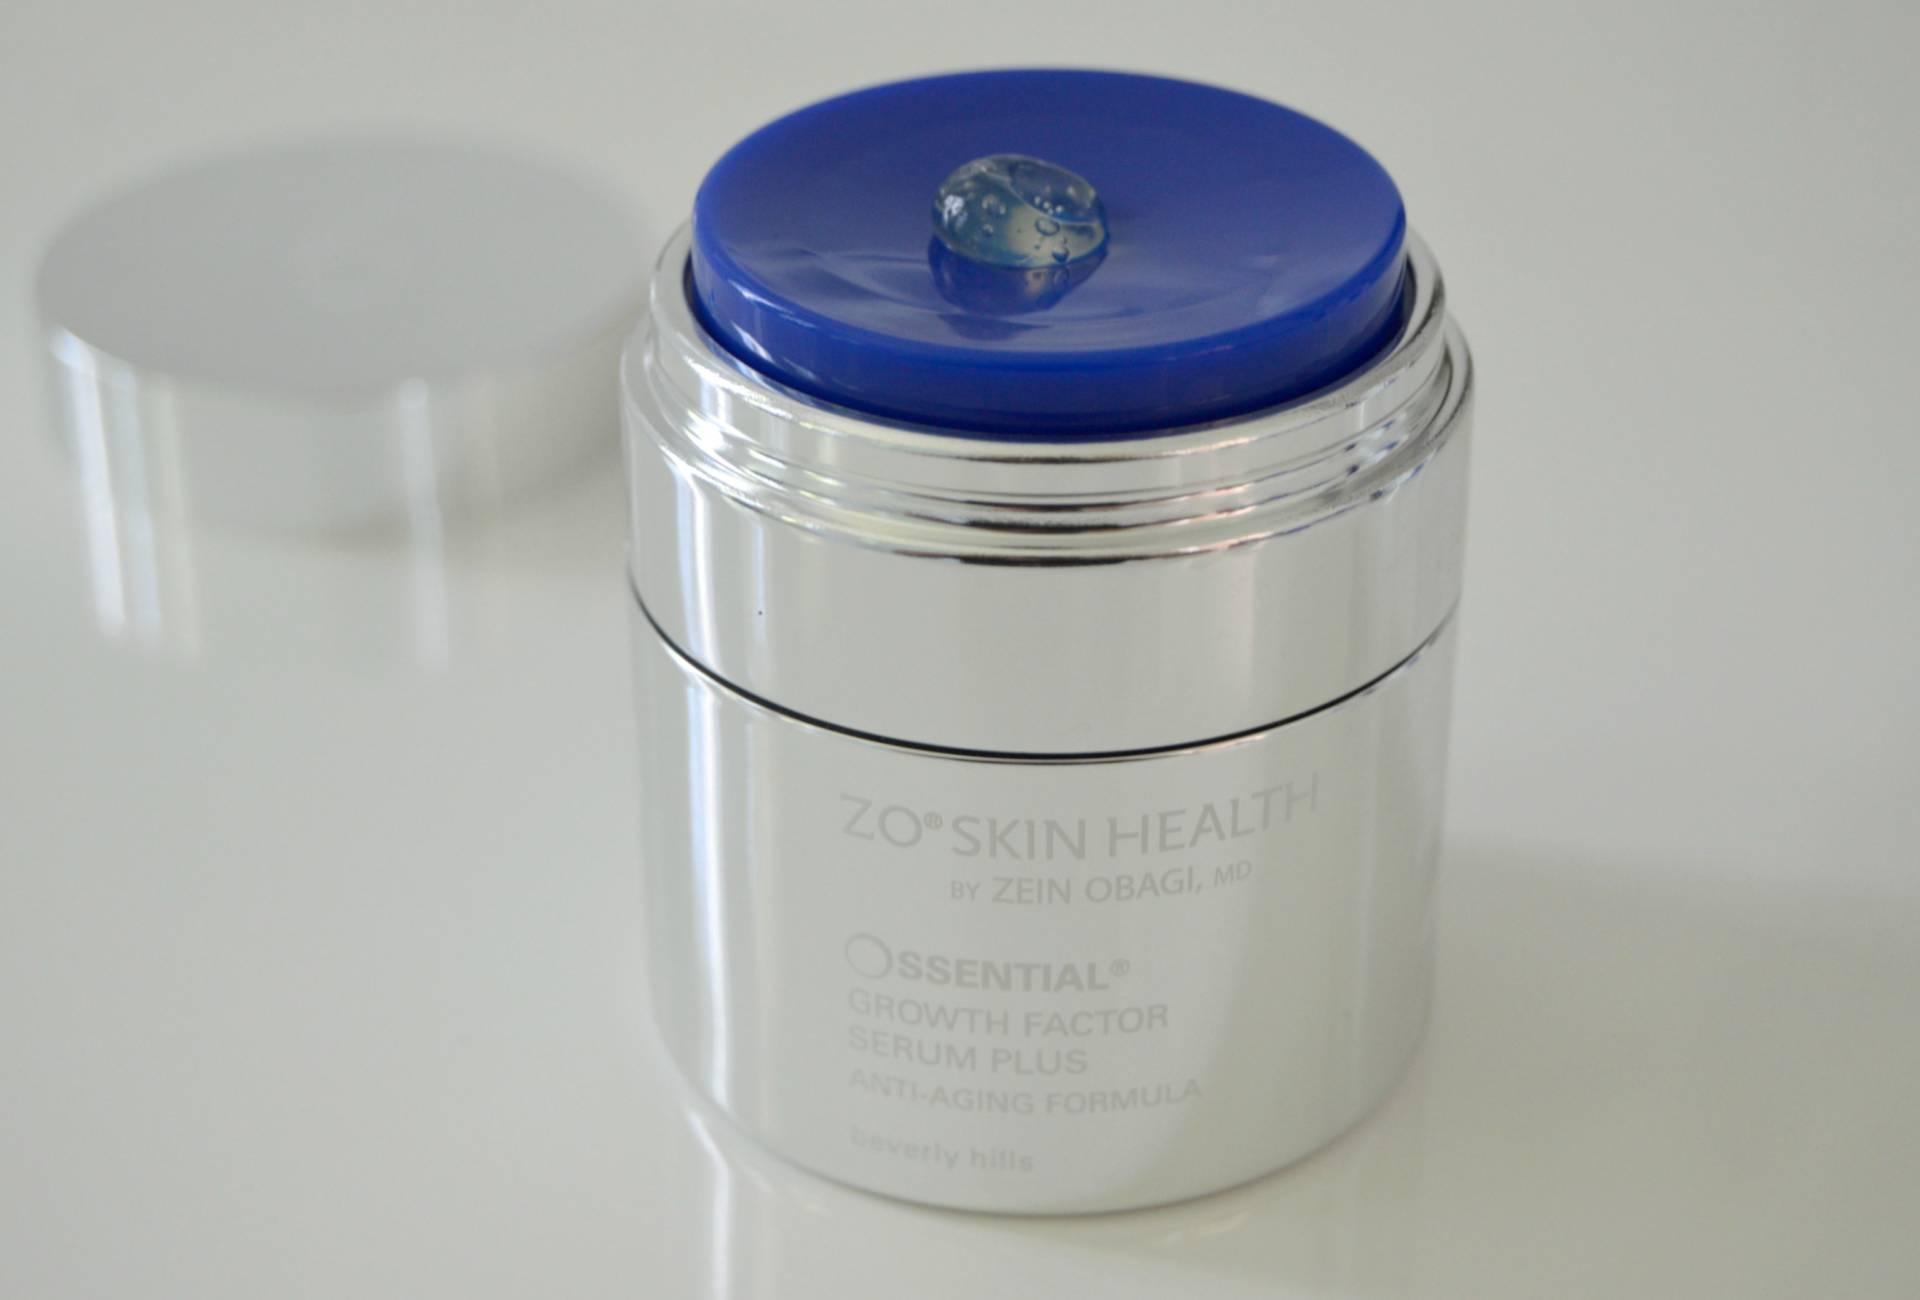 zo-skin-health-ossential-growth-factor-serum-review-inhautepursuit